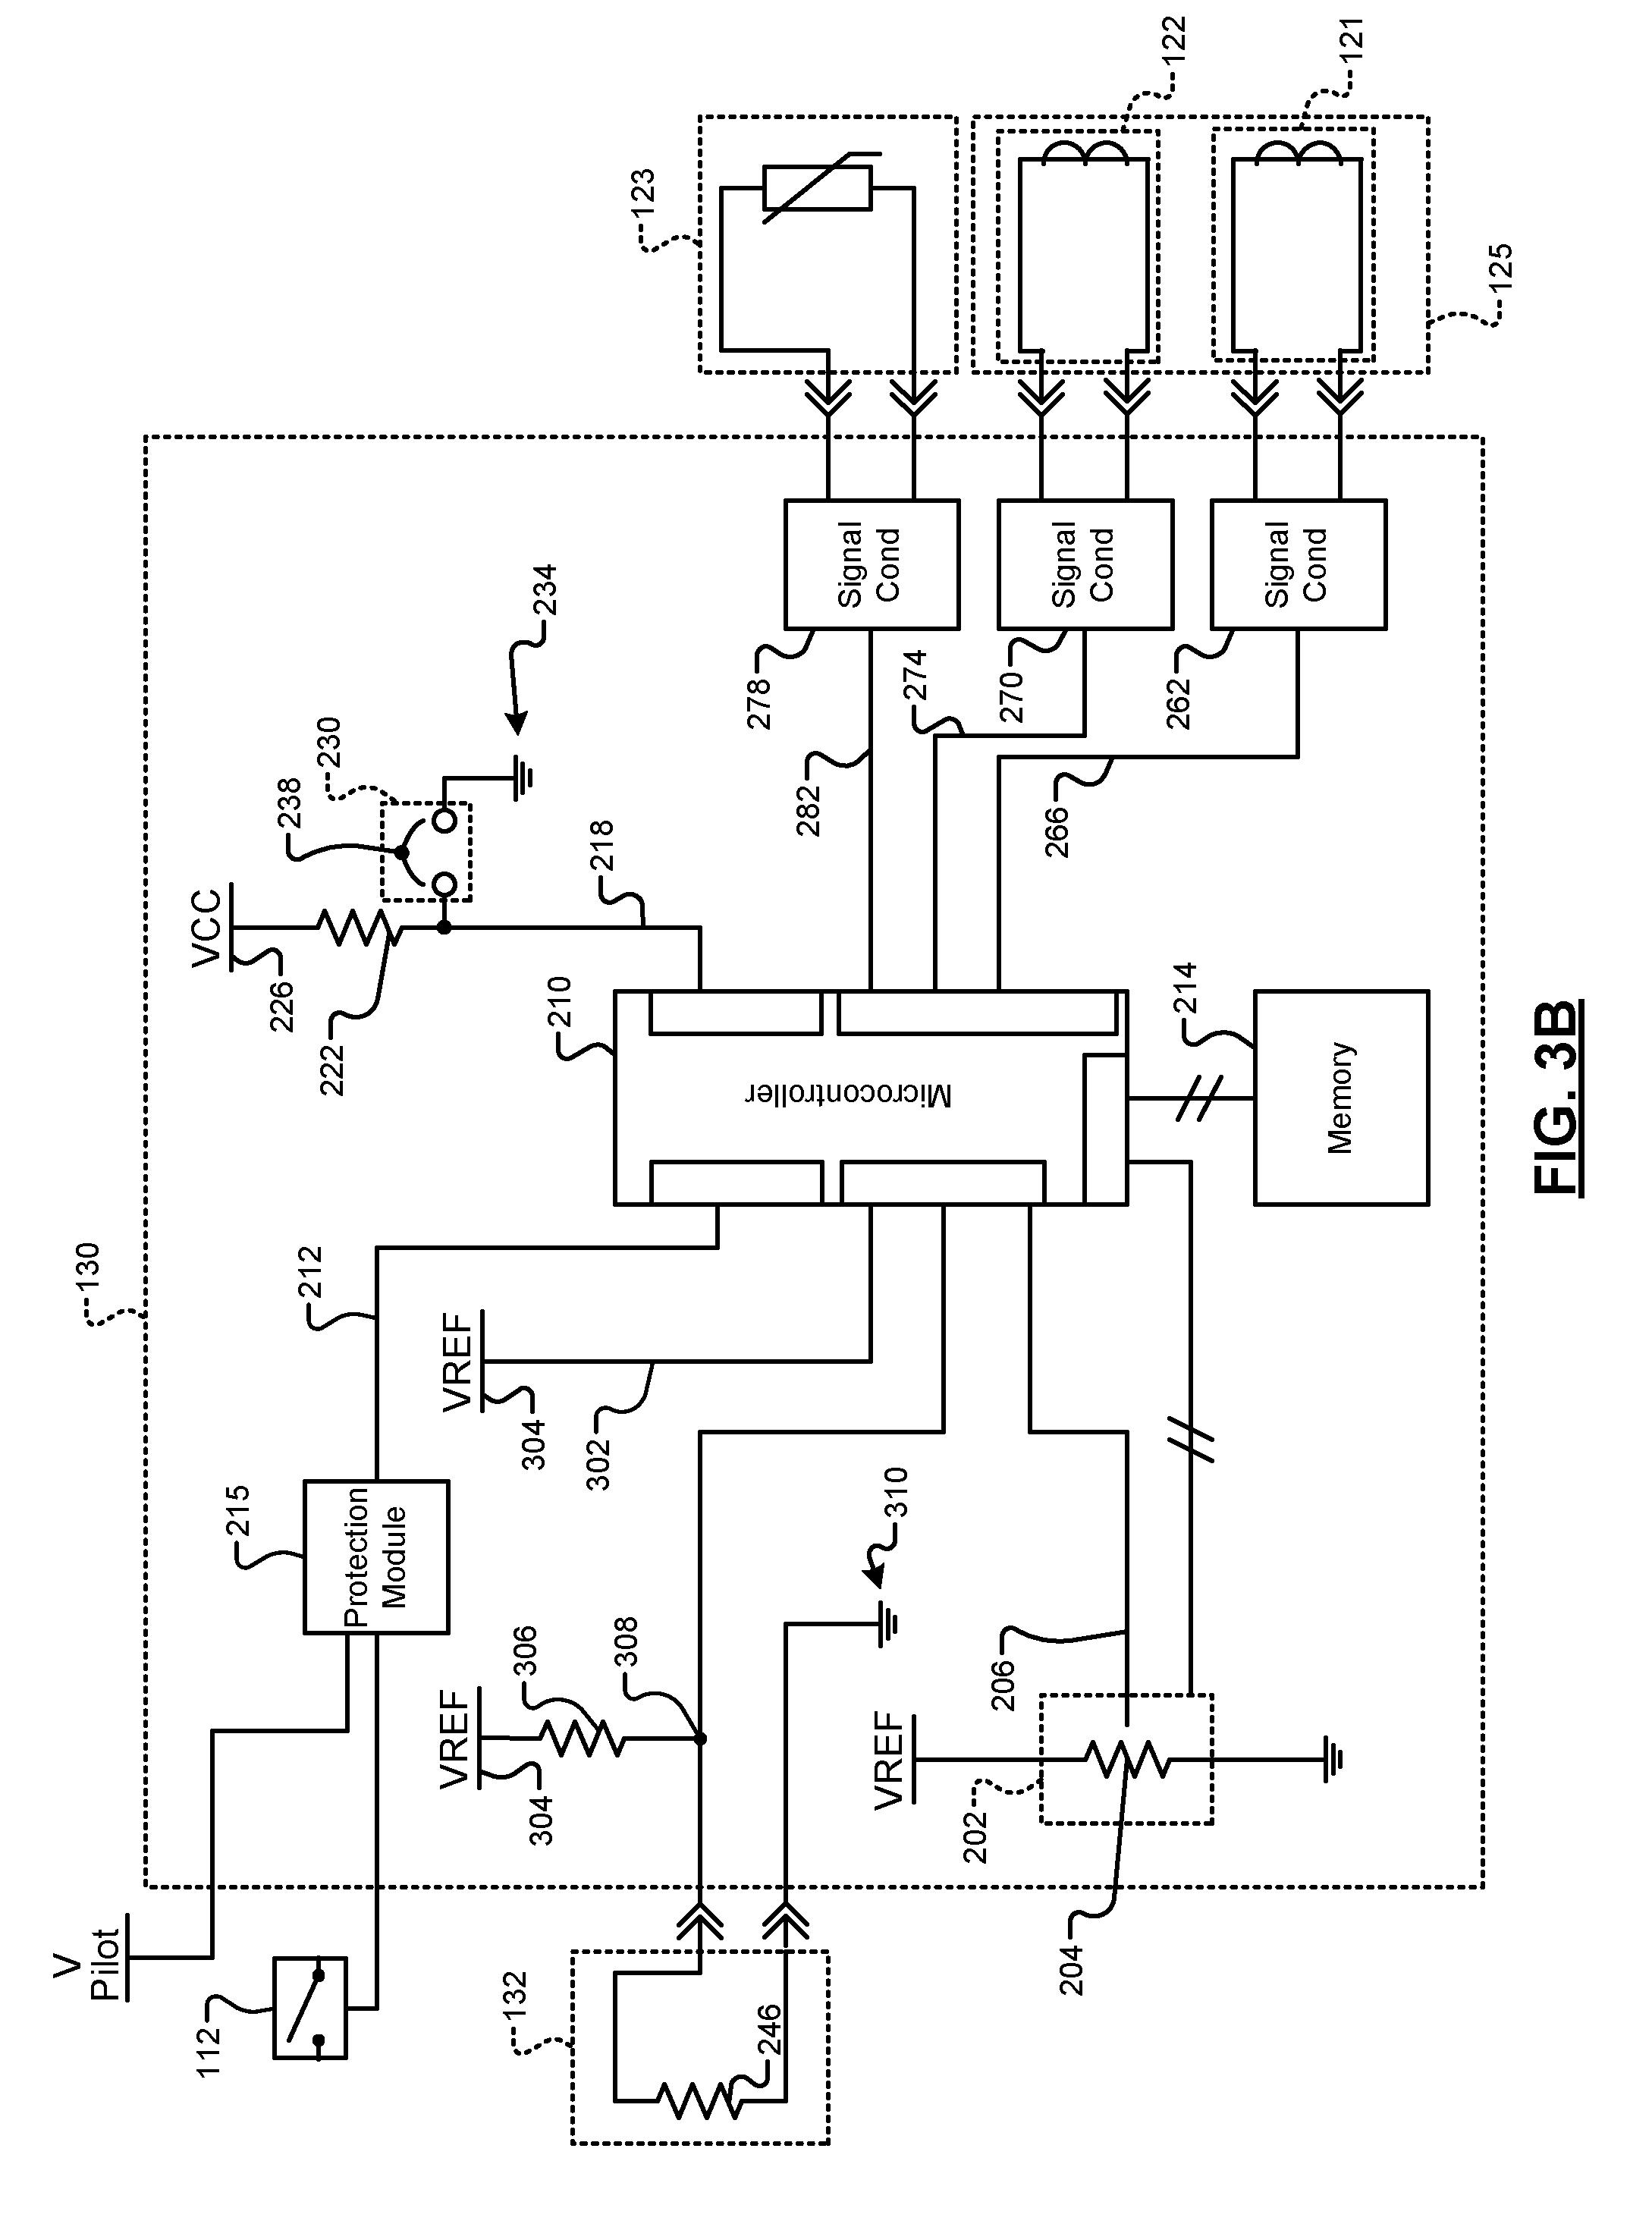 Patent US 9,876,346 B2 on